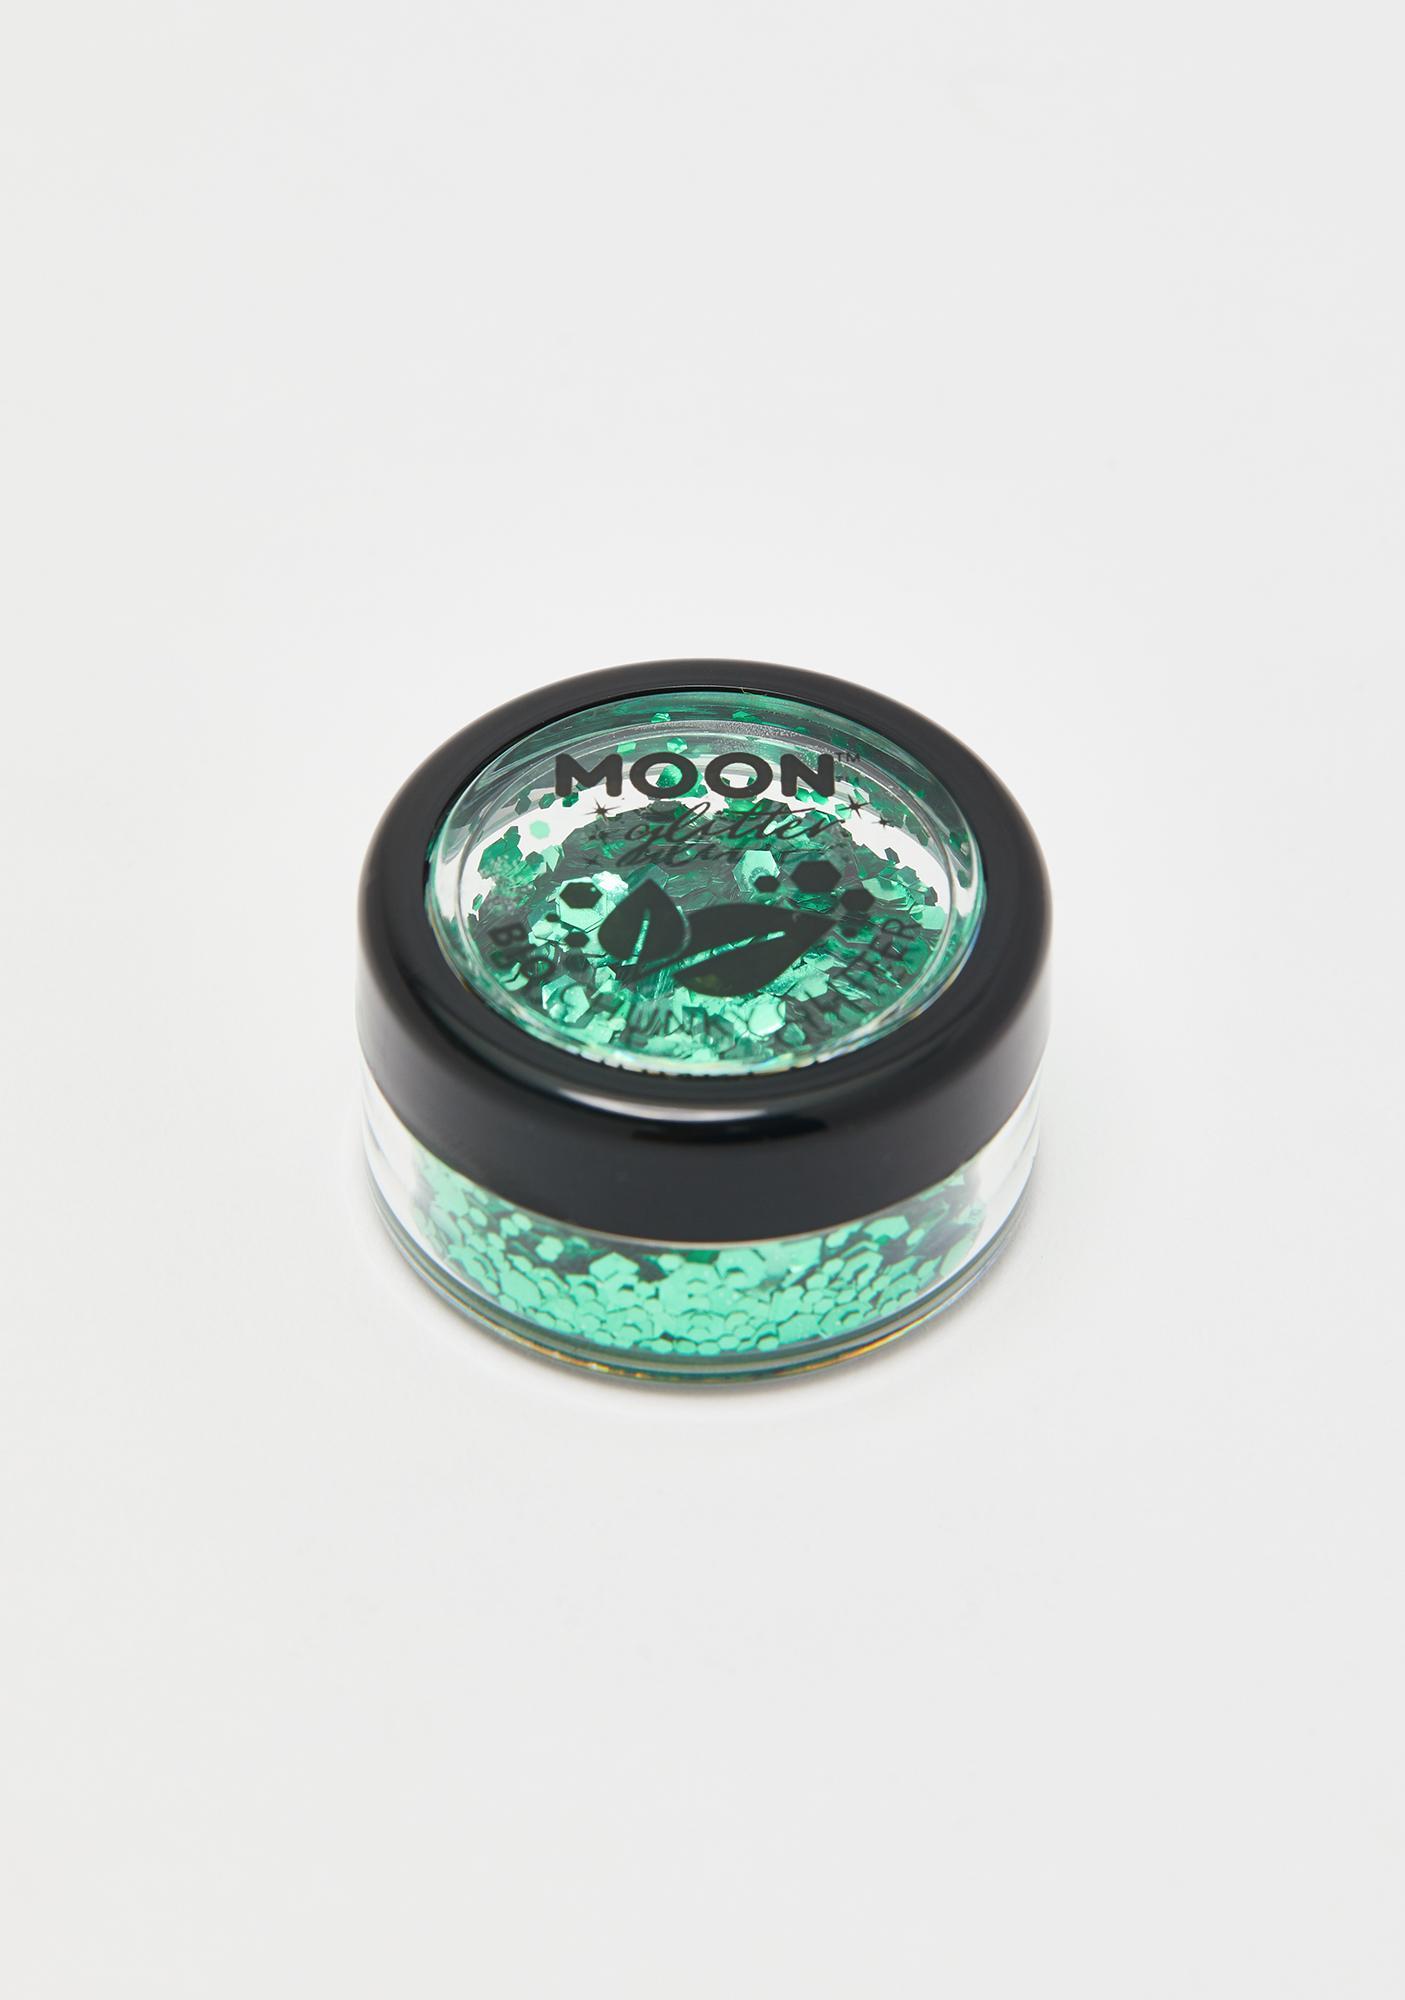 Moon Creations Emerald Bio Chunky Glitter